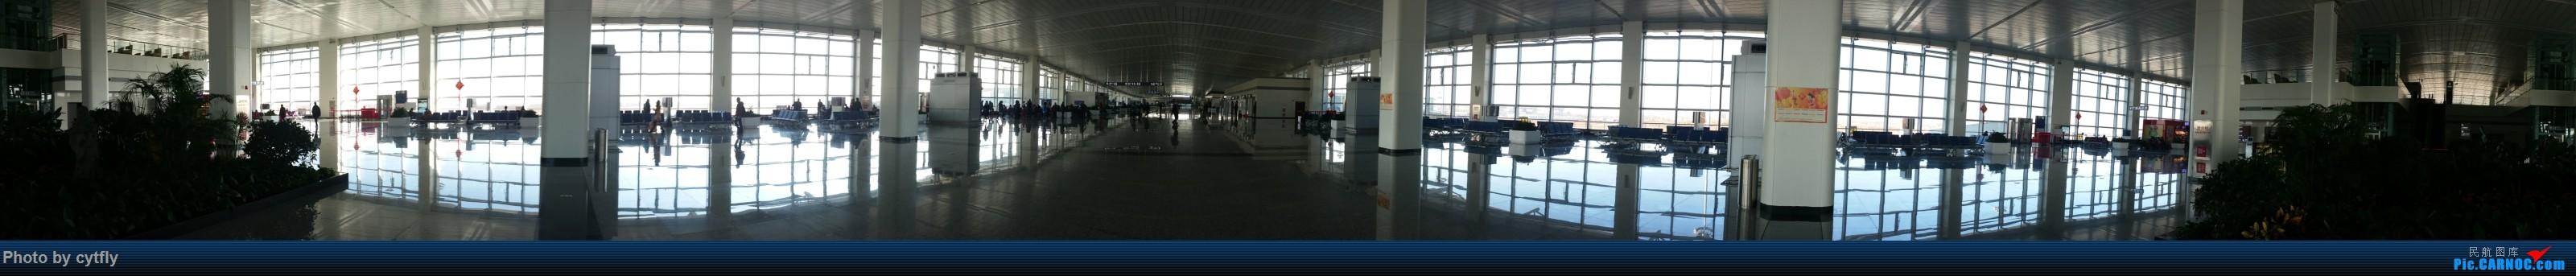 Re:[原创]SJW-SYX-PEK 三亚Holiday AIRBUS A320-200 B-6652 中国石家庄正定国际机场 中国石家庄正定国际机场